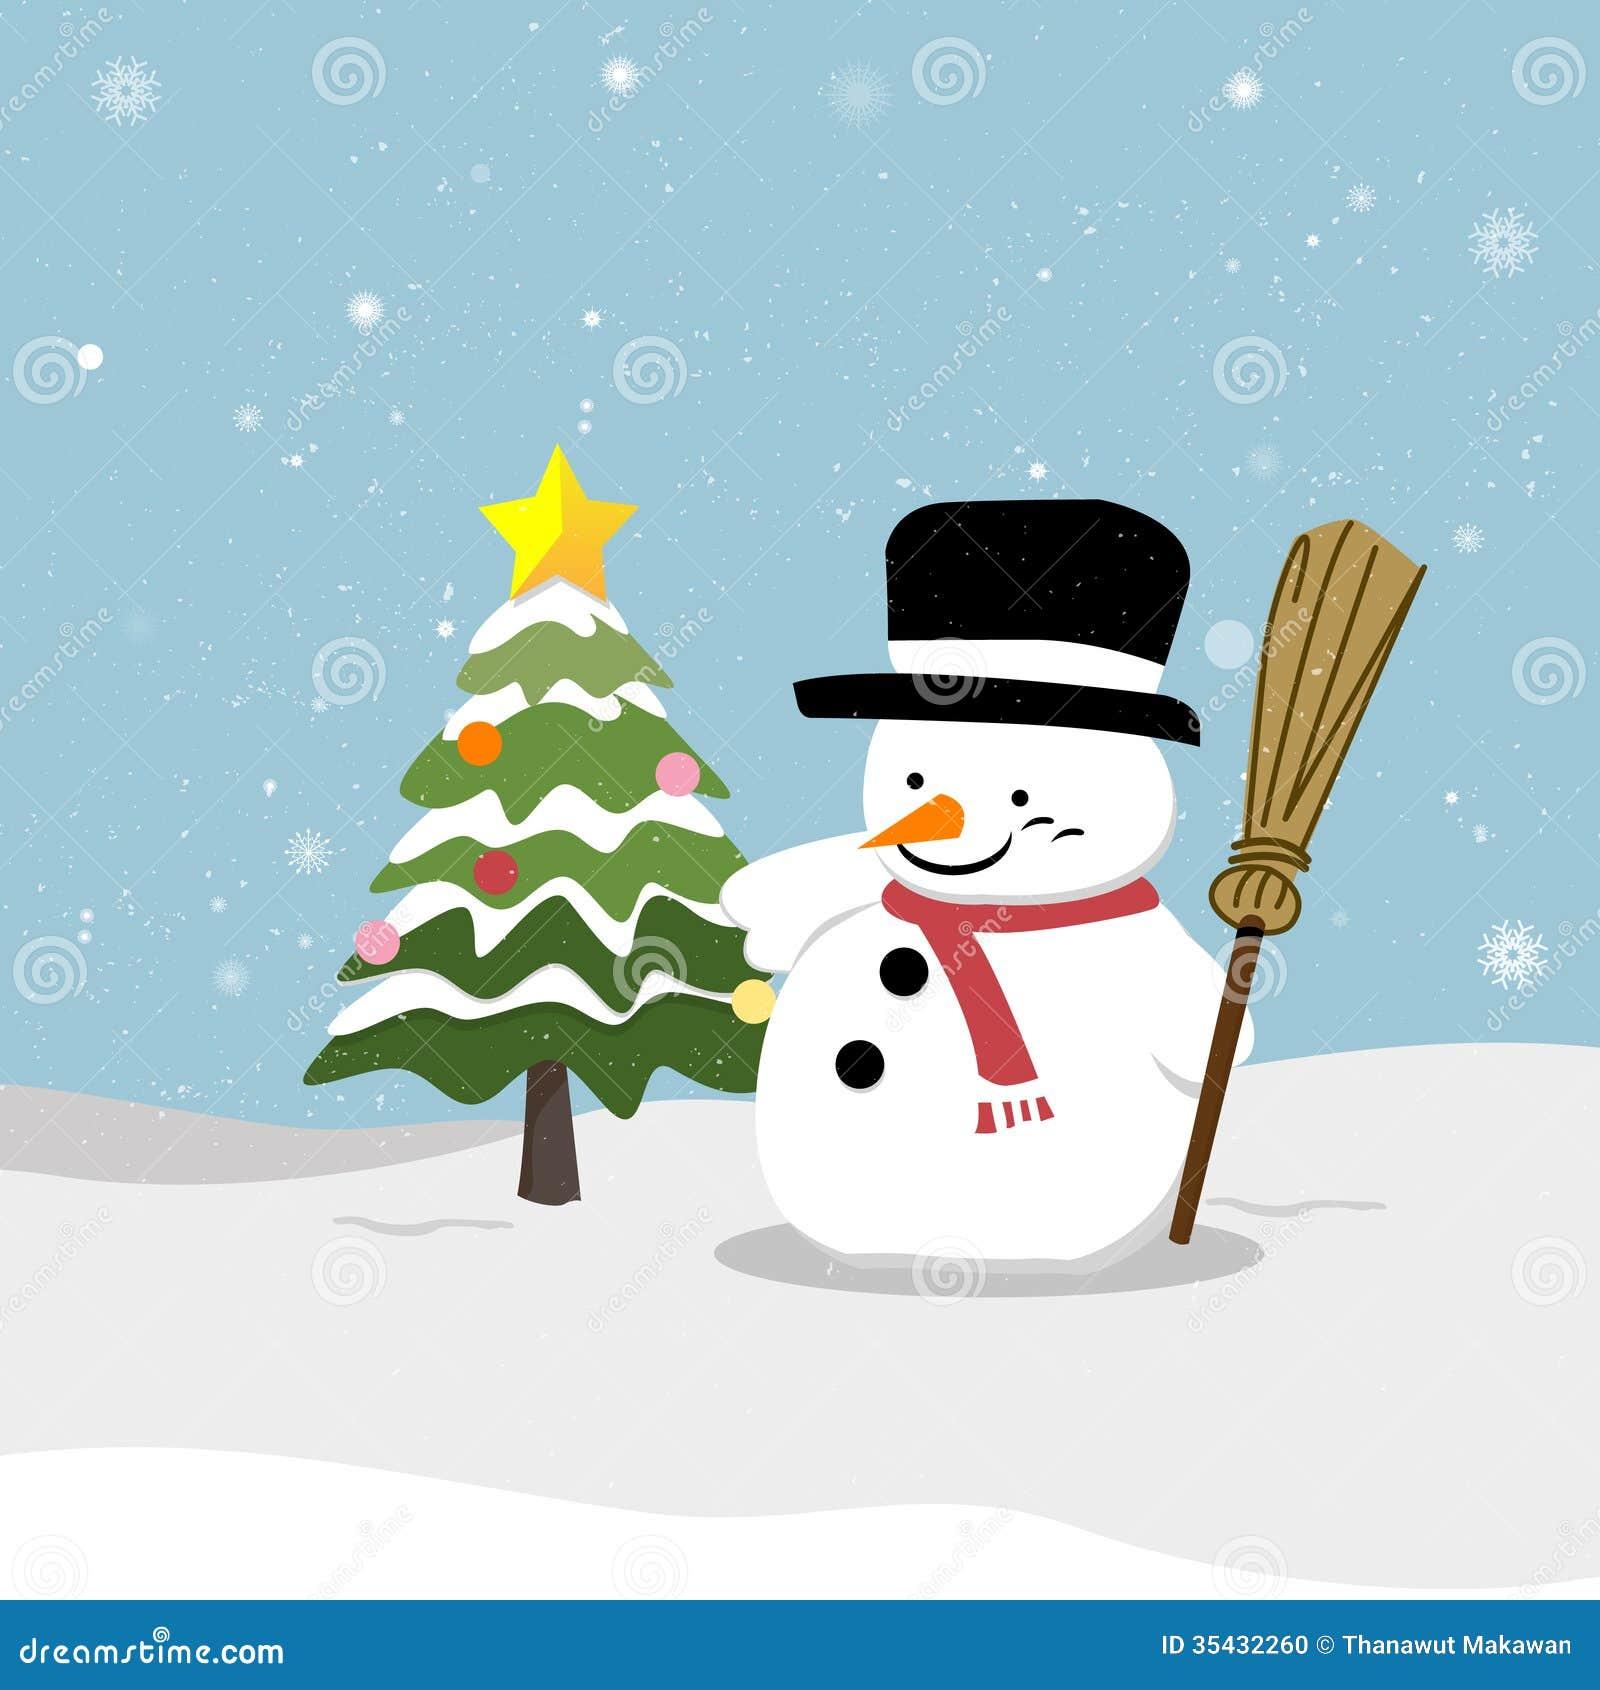 Snowman With Christmas Tree Stock Photo - Image: 35432260